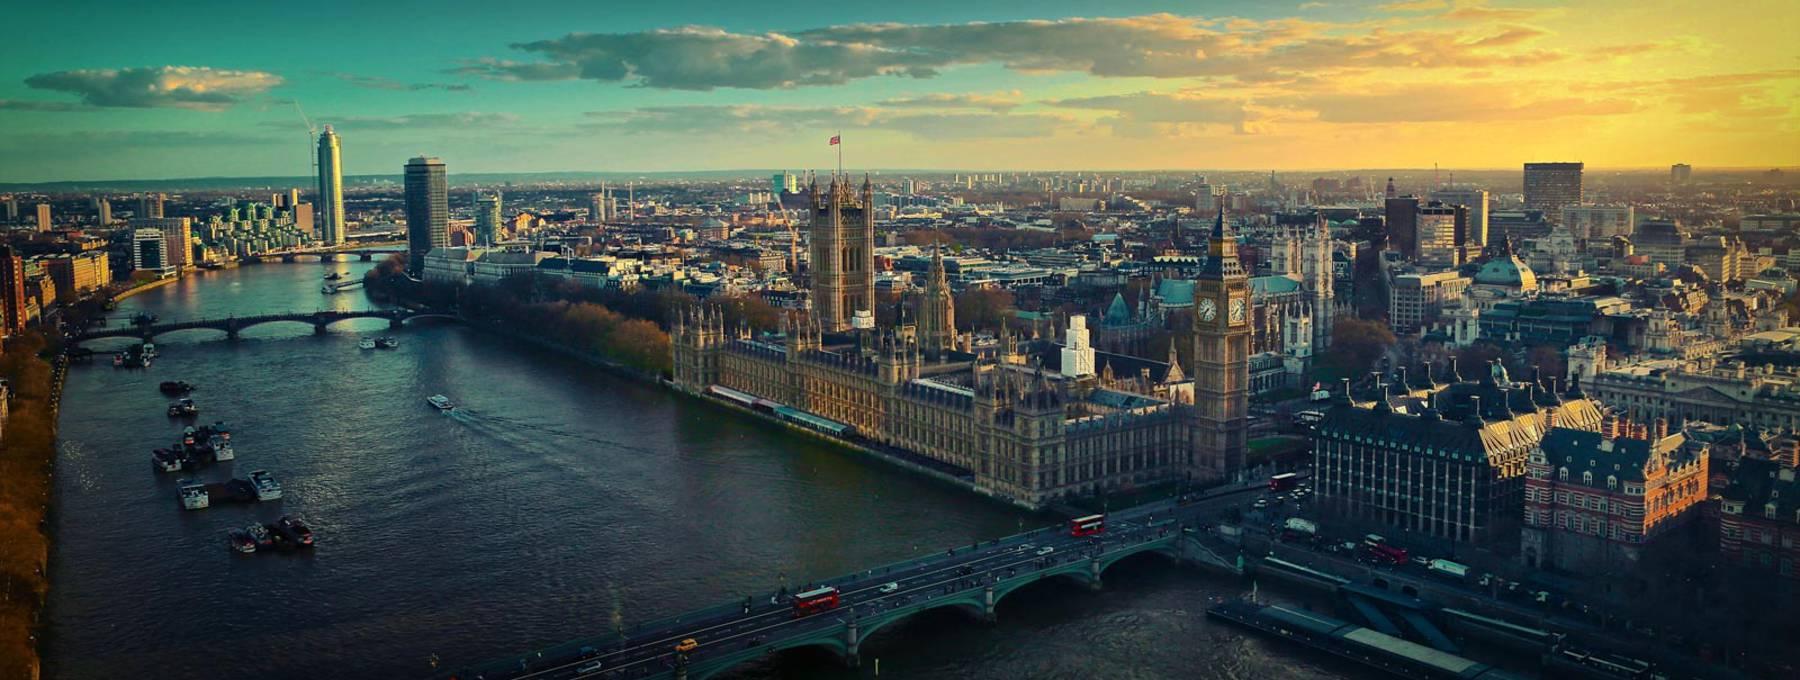 Auslandsaufenthalt England